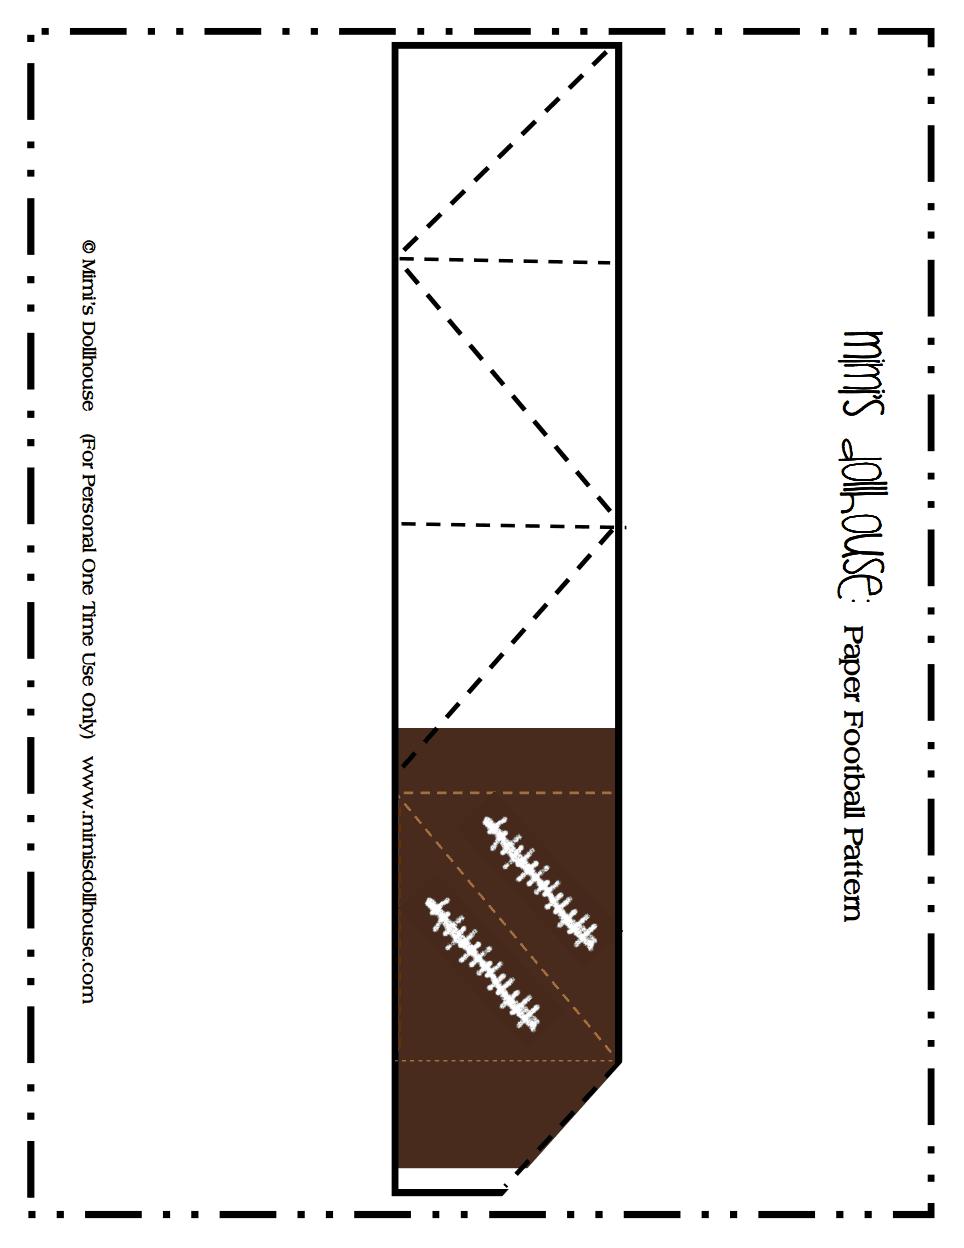 Paper Football Patternpdf